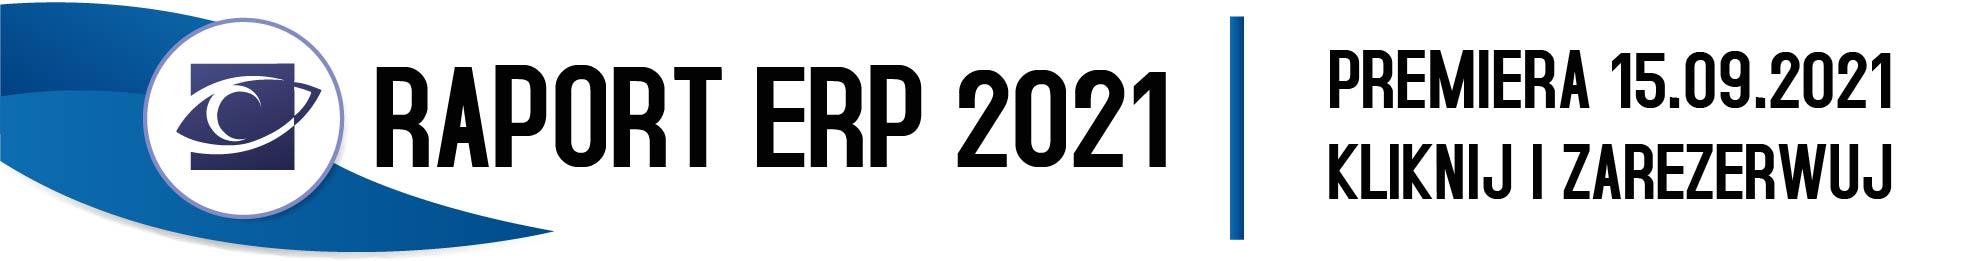 RAPORT ERP 2021 - PORÓWNAJ SYSTEMY ERP